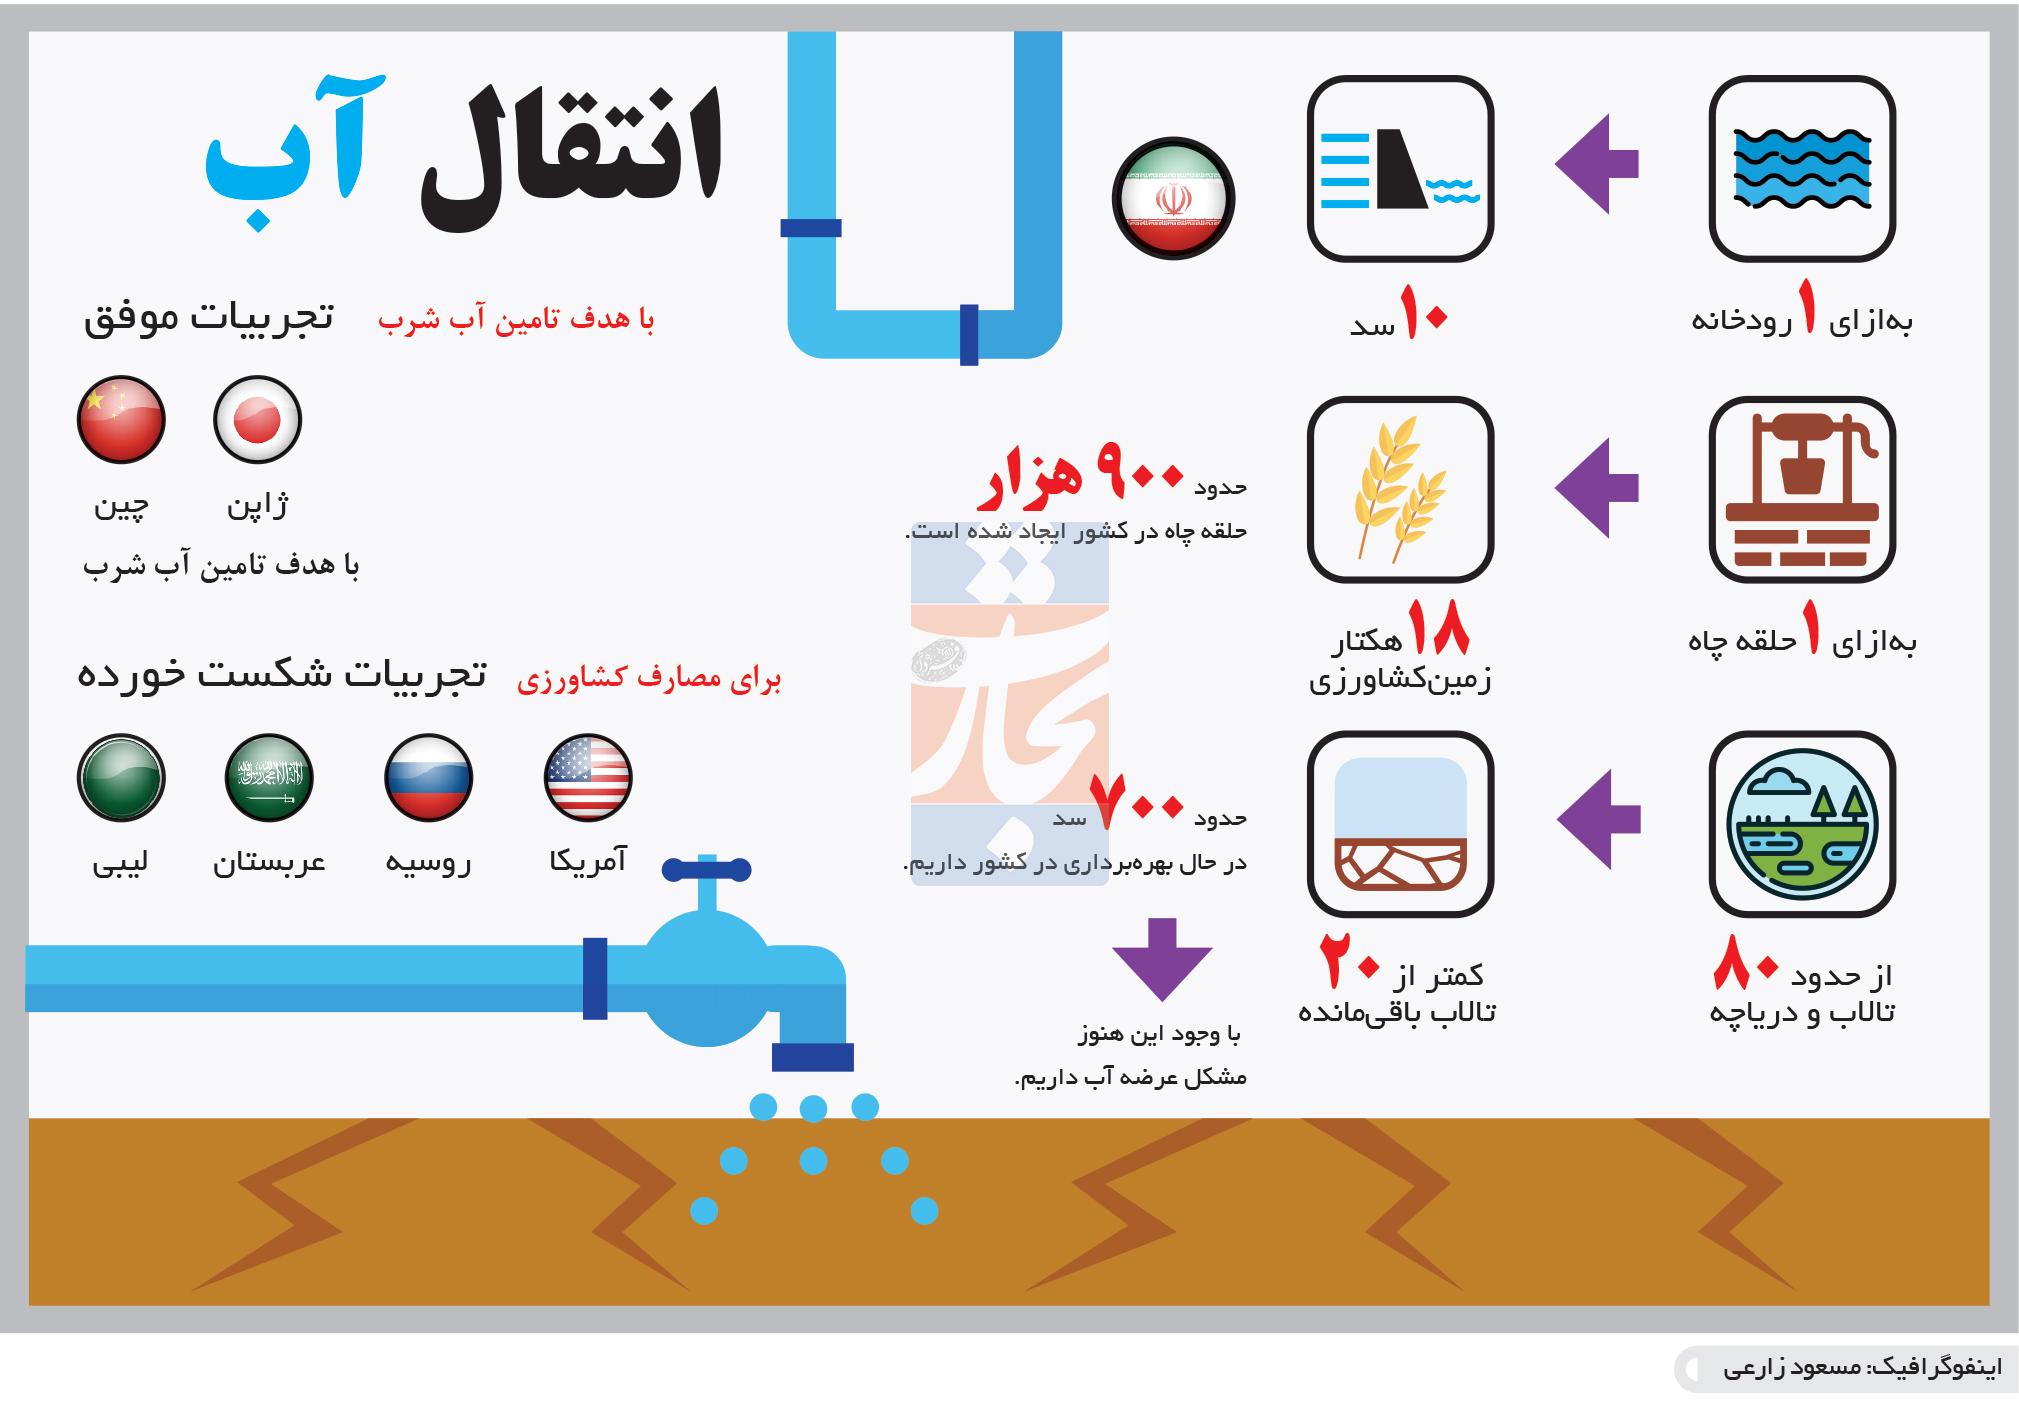 تجارت- فردا- انتقال آب(اینفوگرافیک)